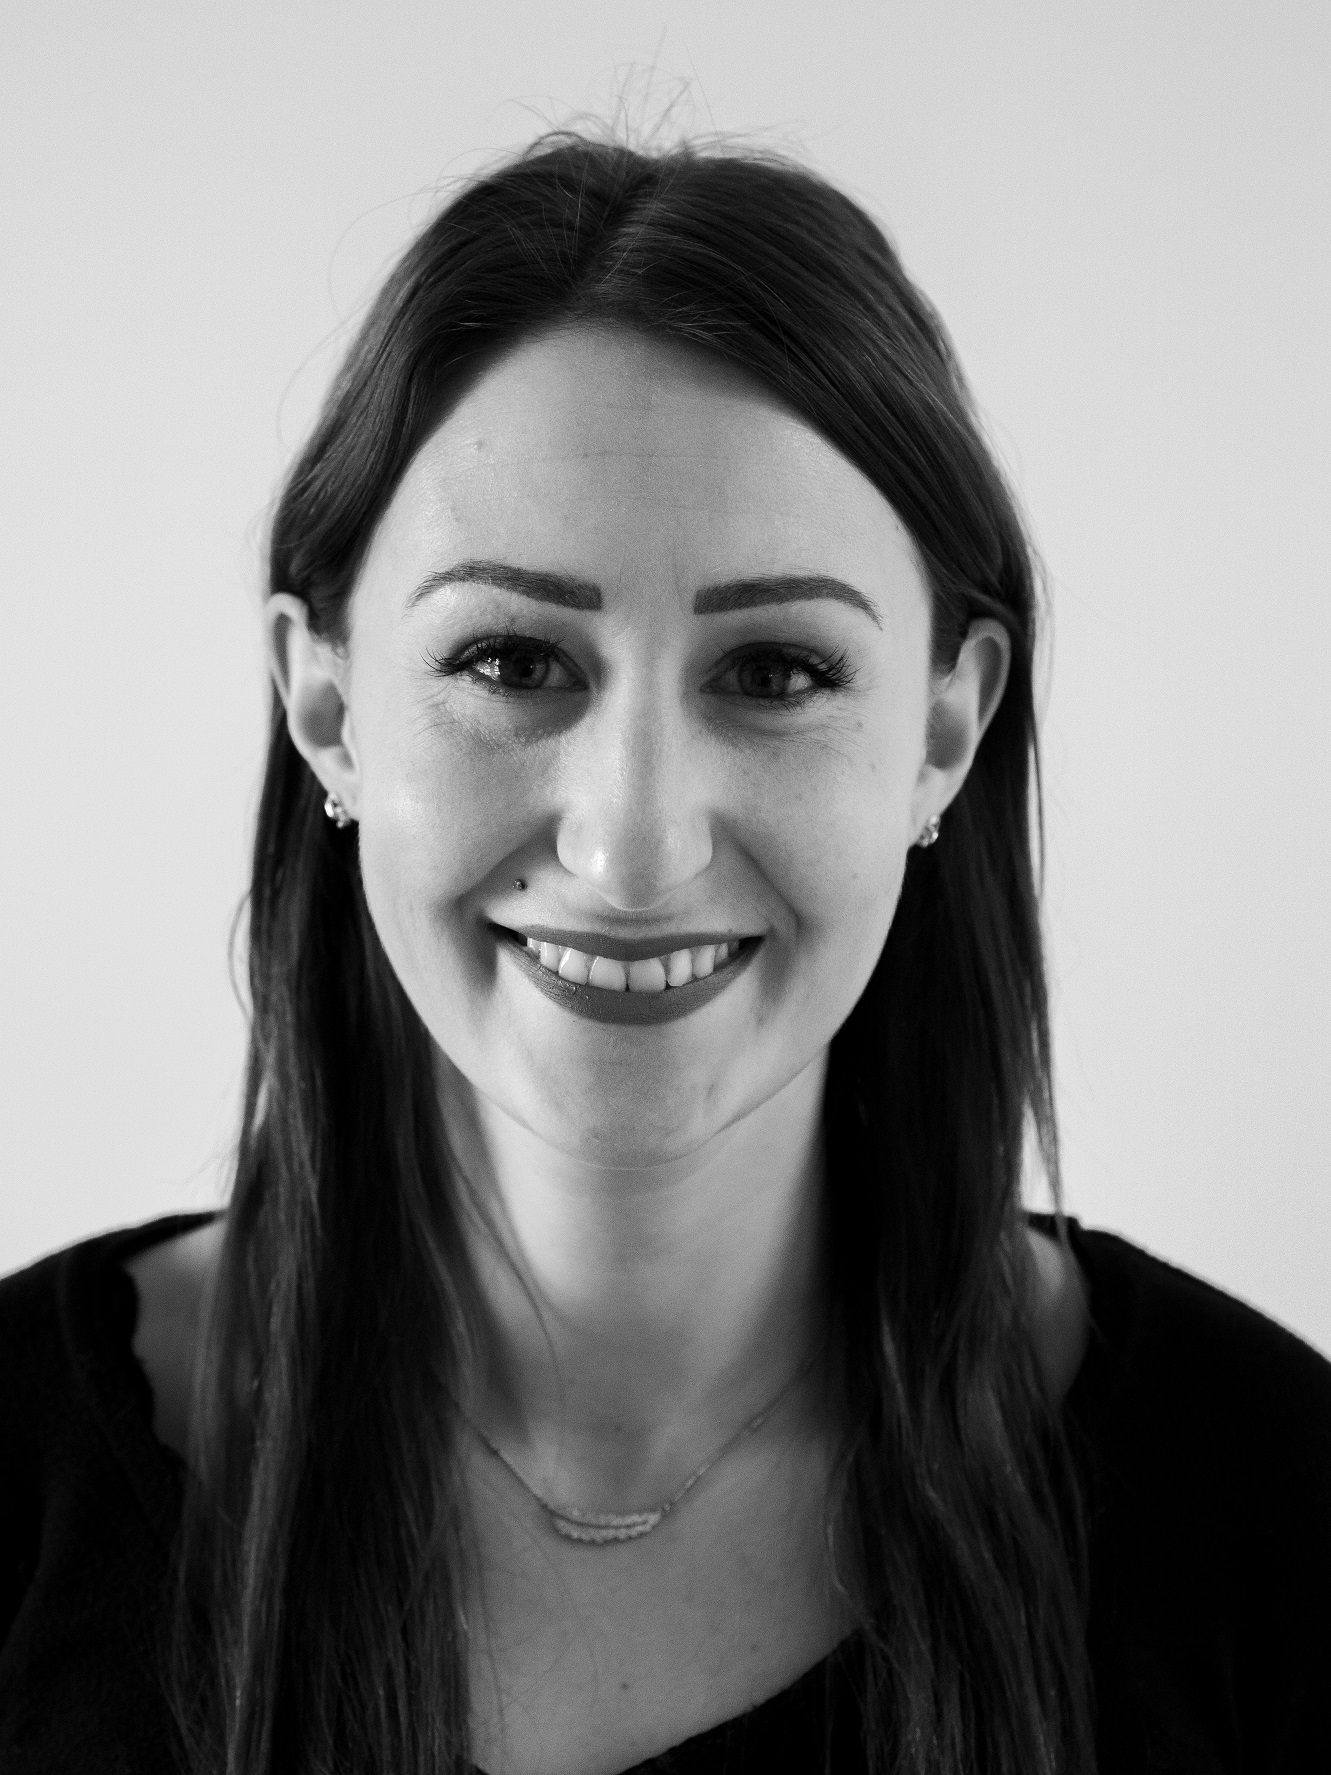 Marion Barbetta